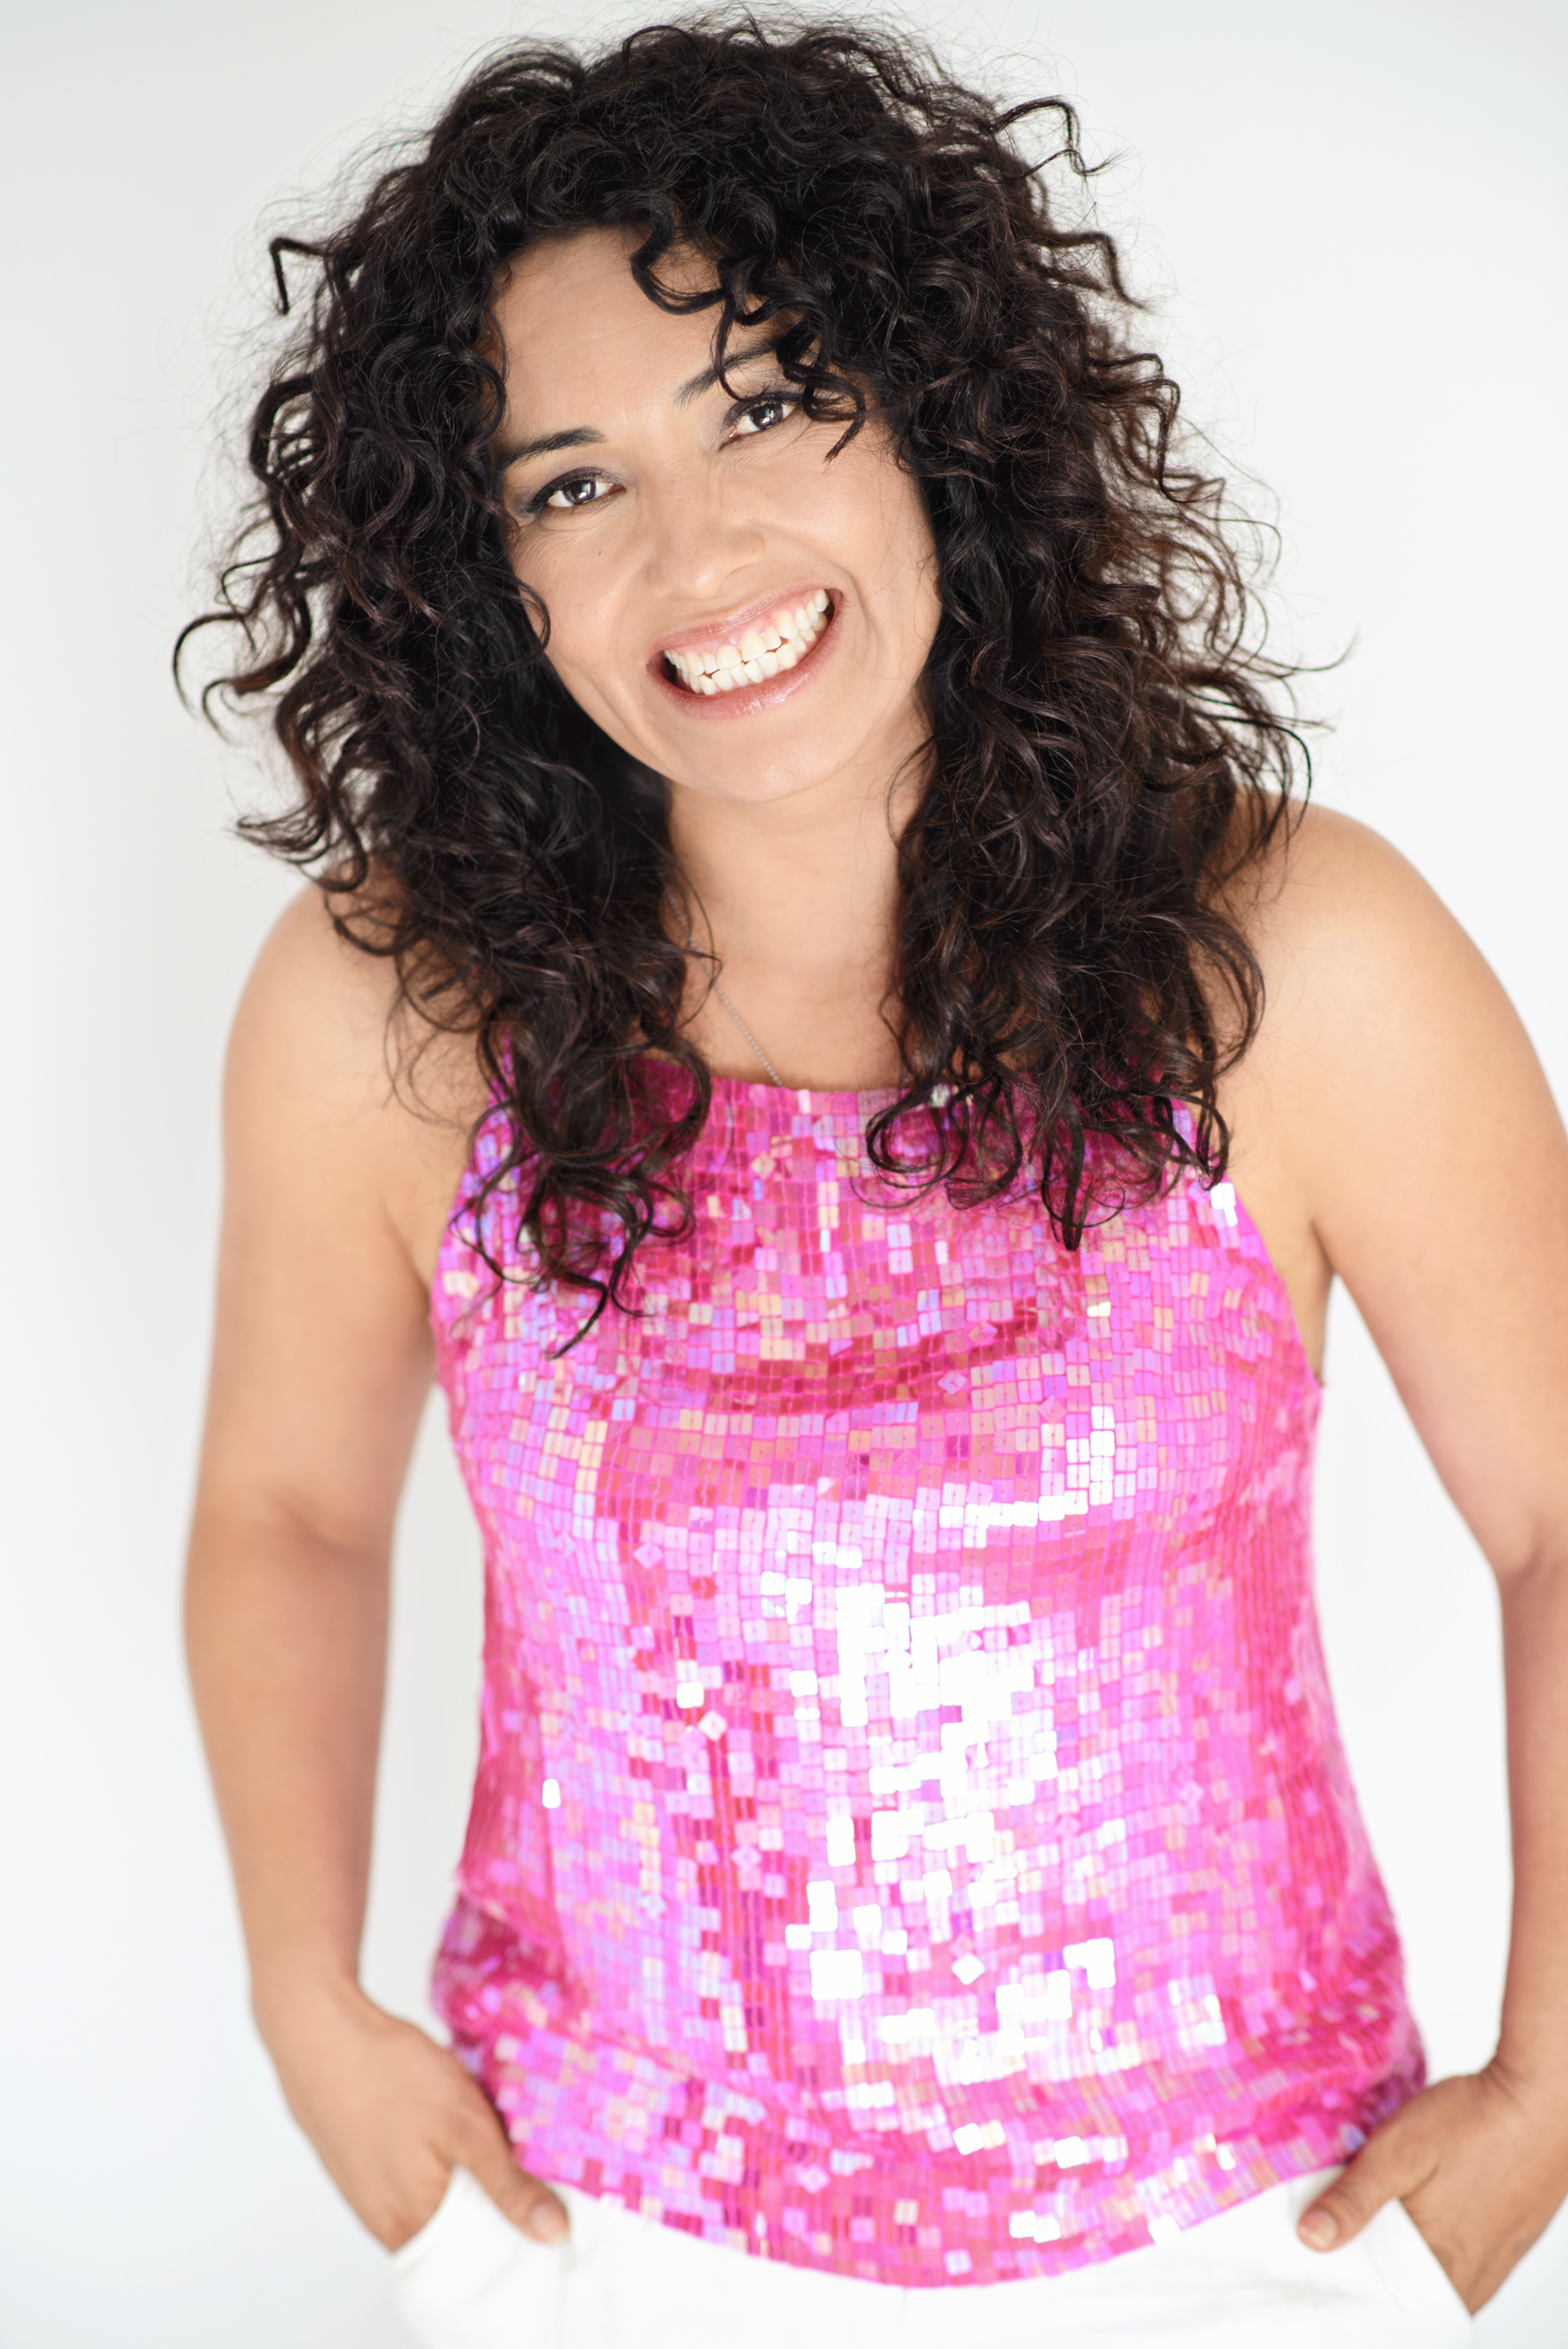 Melissa-Alcantar-Fotografia-Sesion-fotos-mexicali-retrato-brillos-texturas-14.jpg